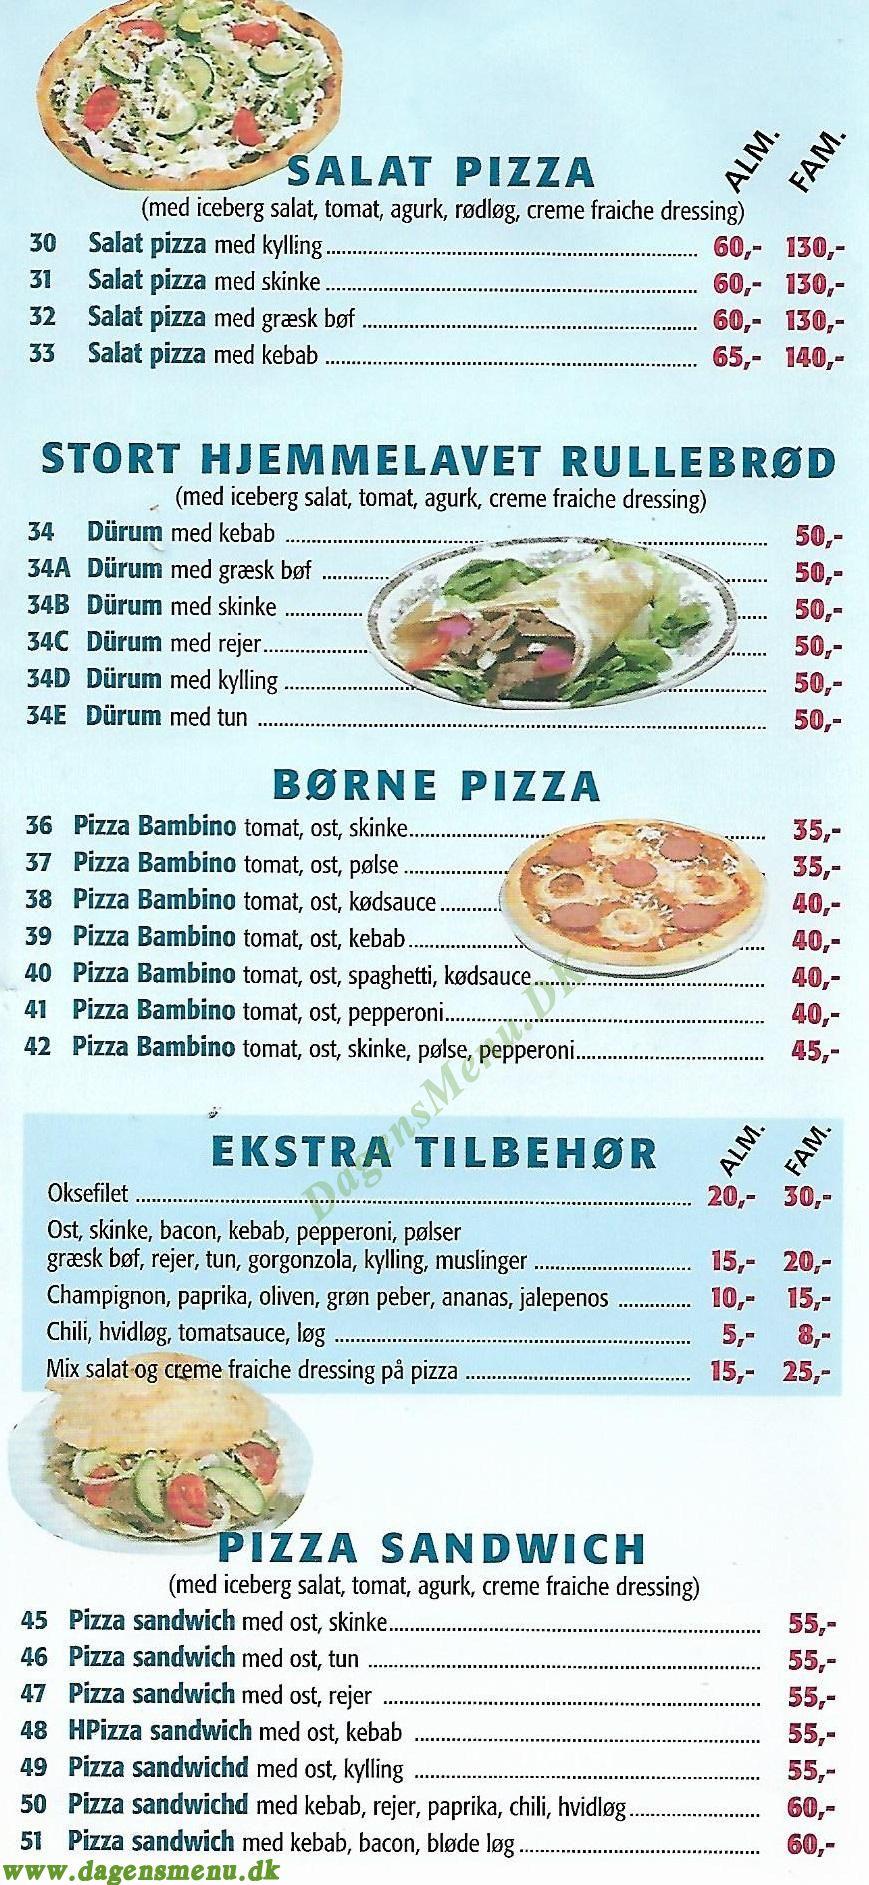 Tuse Næs Pizzabar - Menukort